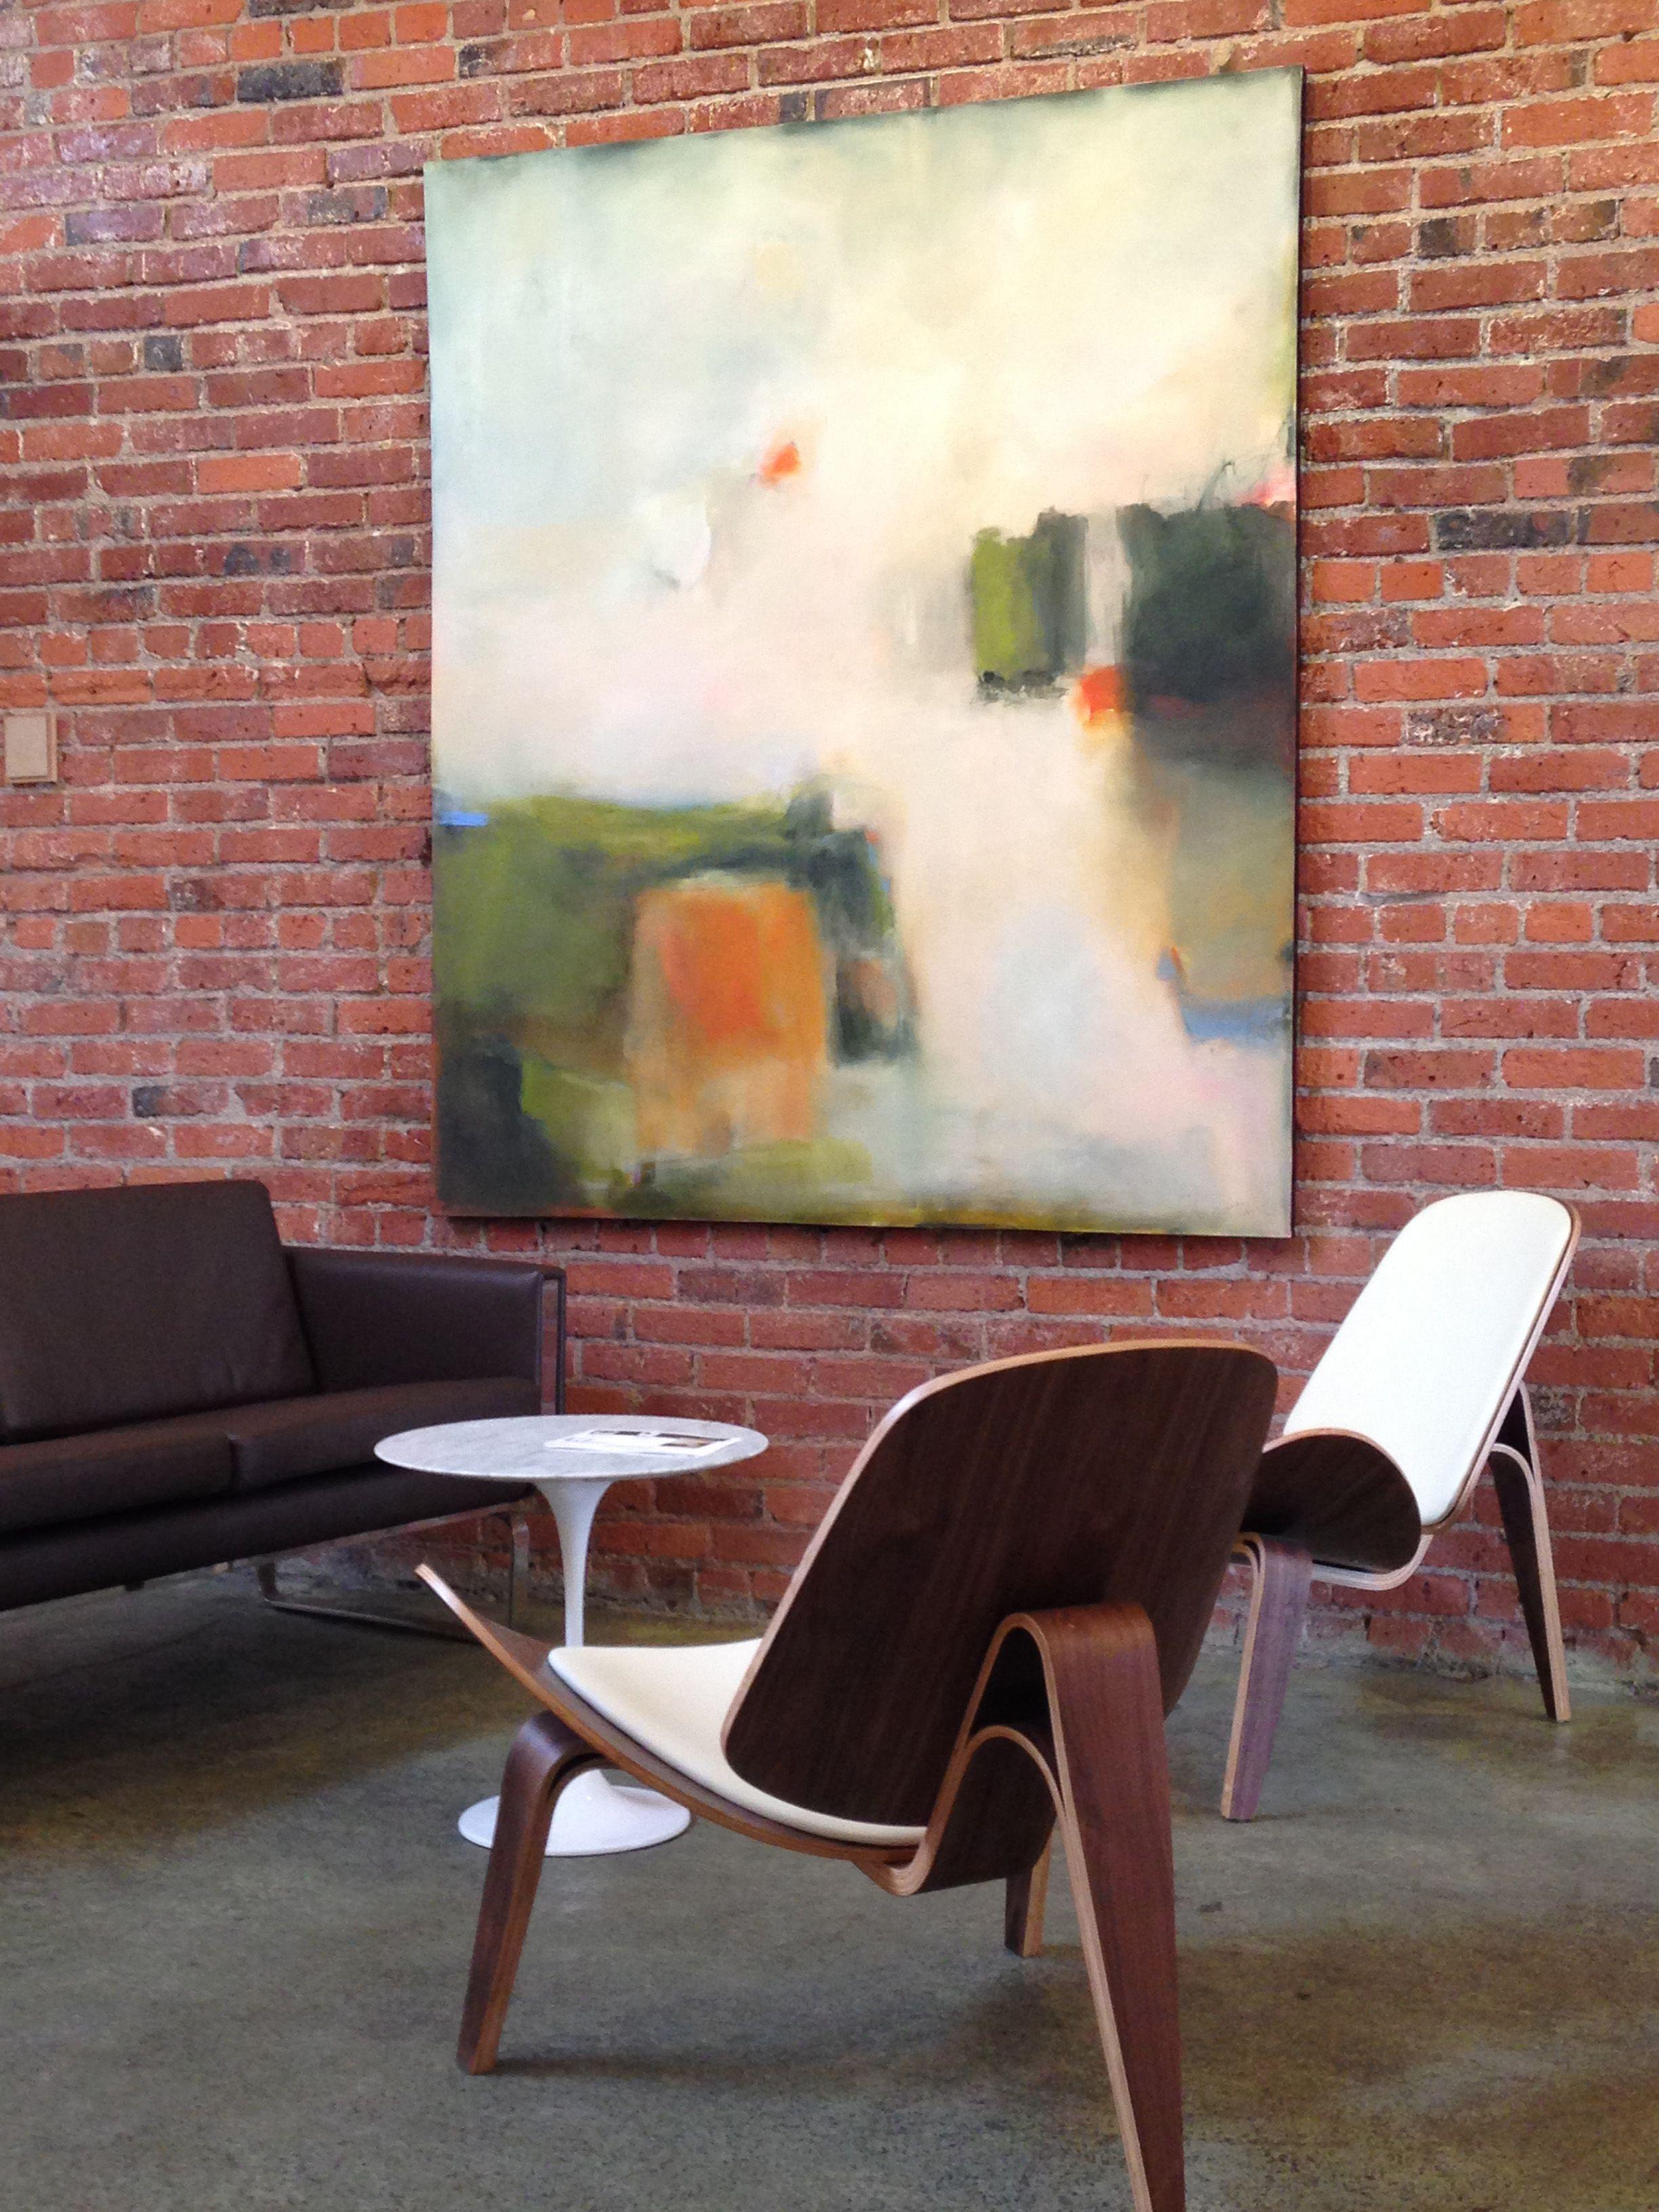 Coupled, Furniture+art At Modernclassics.com Bellingham Showroom. Gravity  By Sharon Kingston